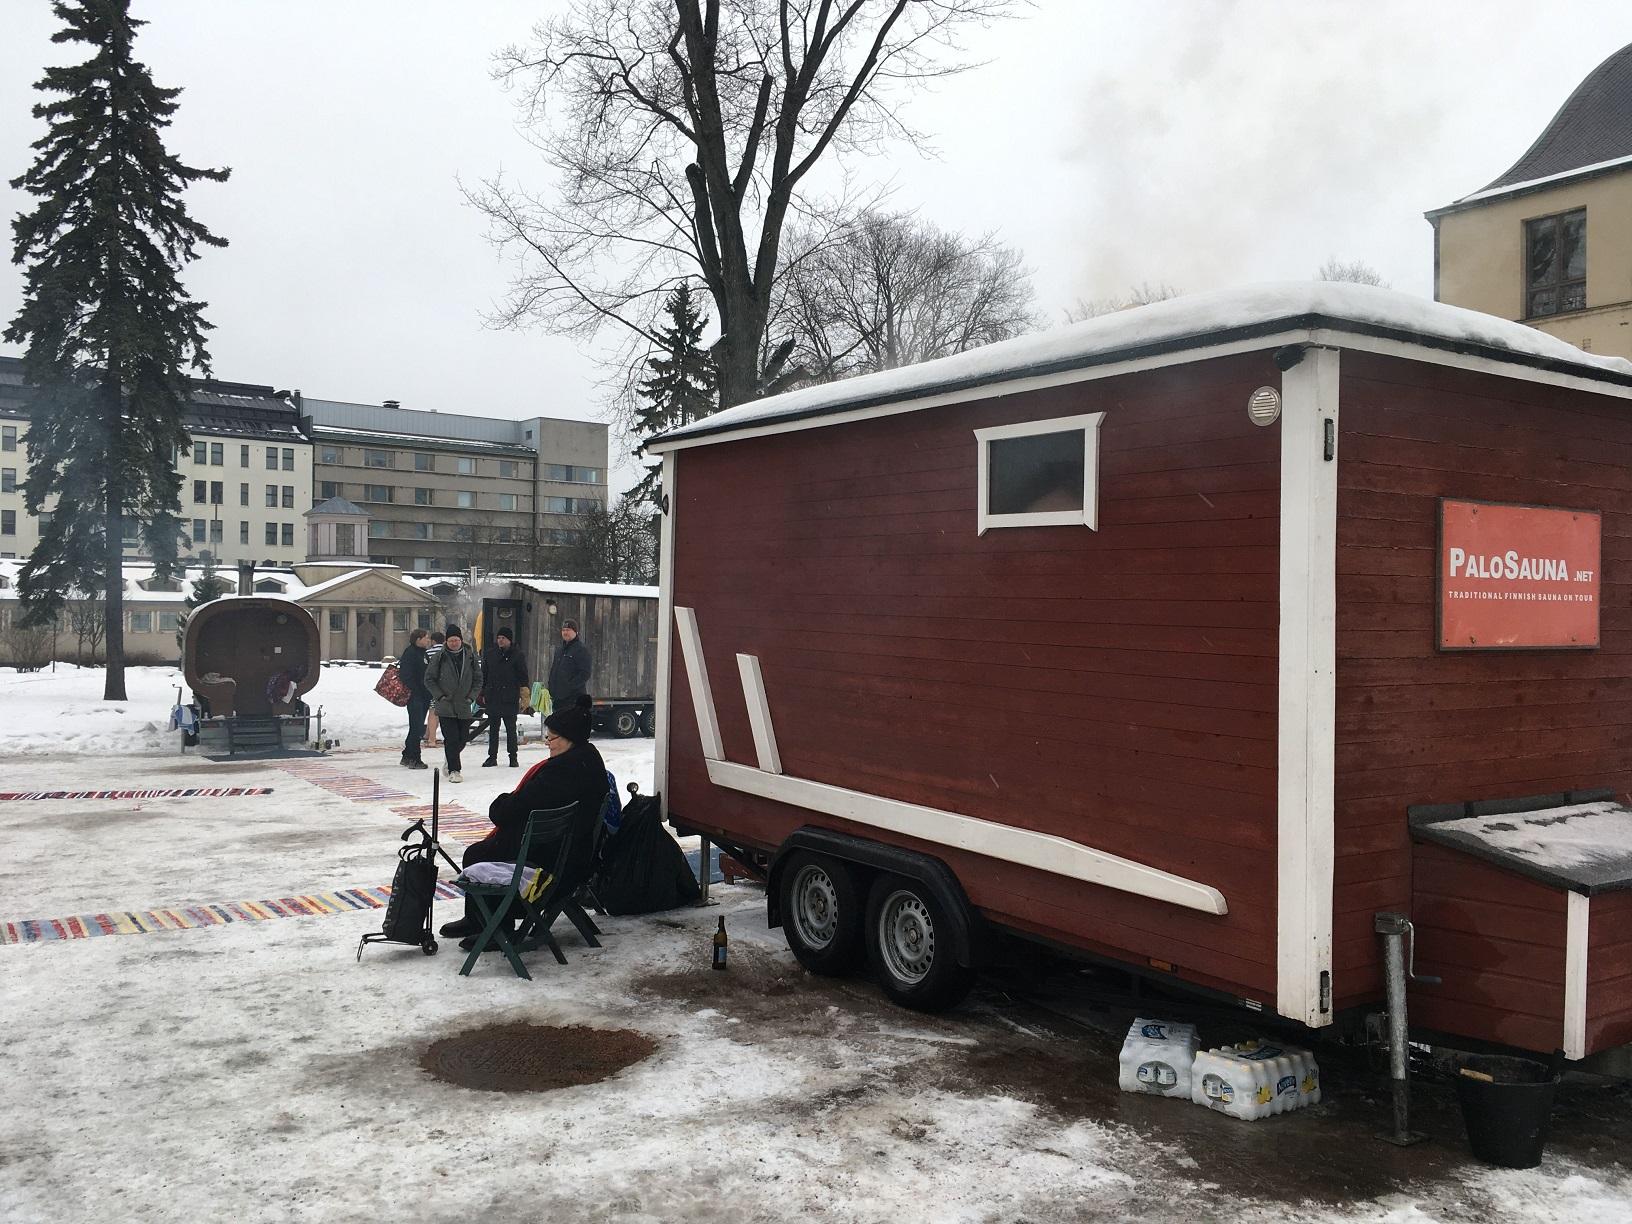 Sauna-Dorf im Museumsinnenhof, Helsinki Sauna Day